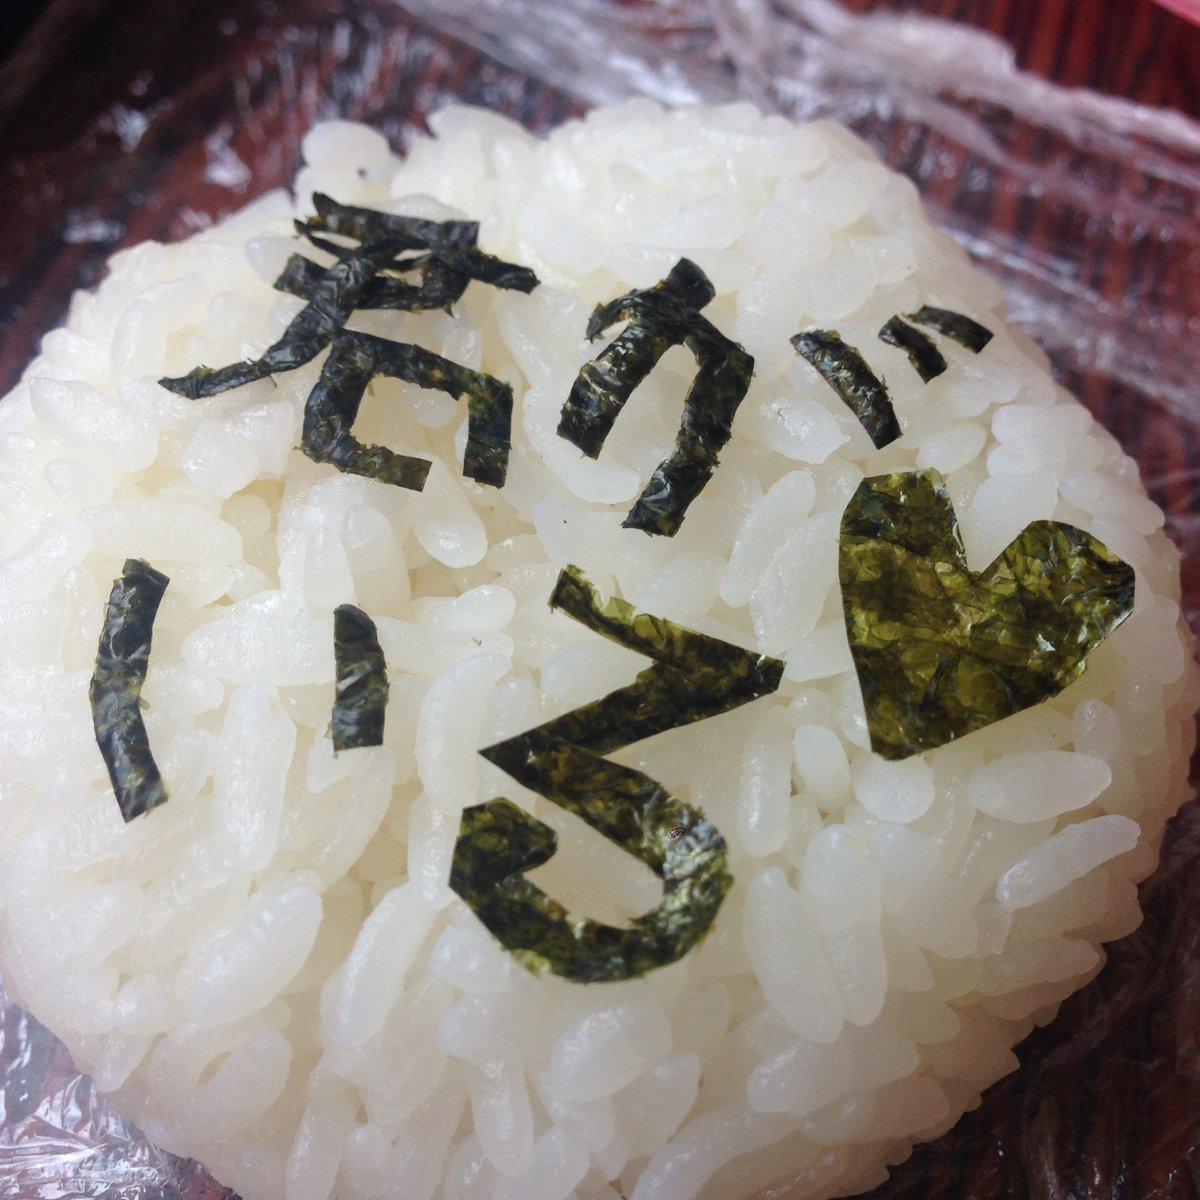 #SMAP25YEARS#onigiri#無限の住人4都市応援上映in名古屋 行かれる方楽しんでくださいね(o^^o)